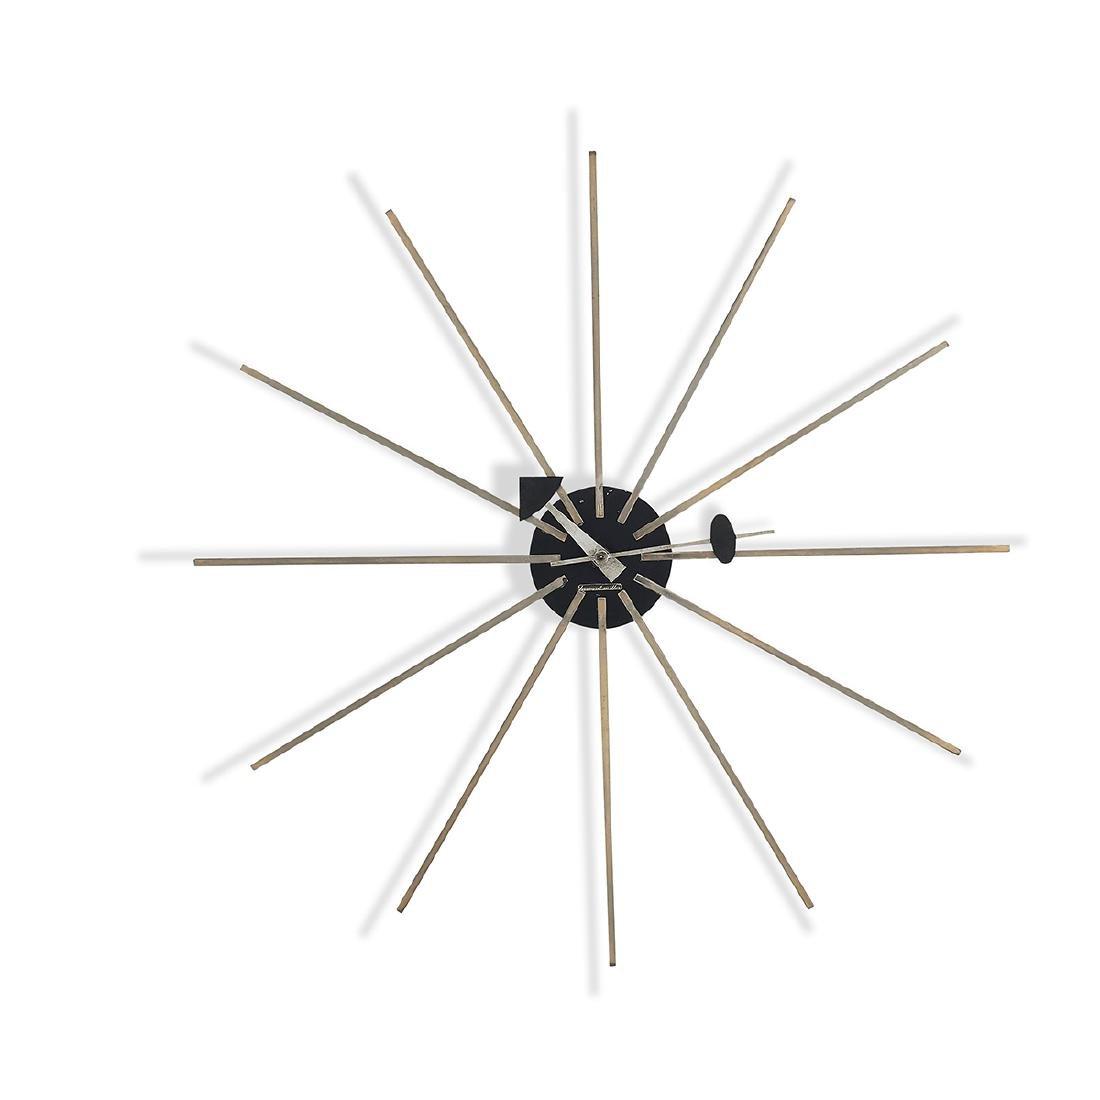 George Nelson Associates Spike clock model 2227A